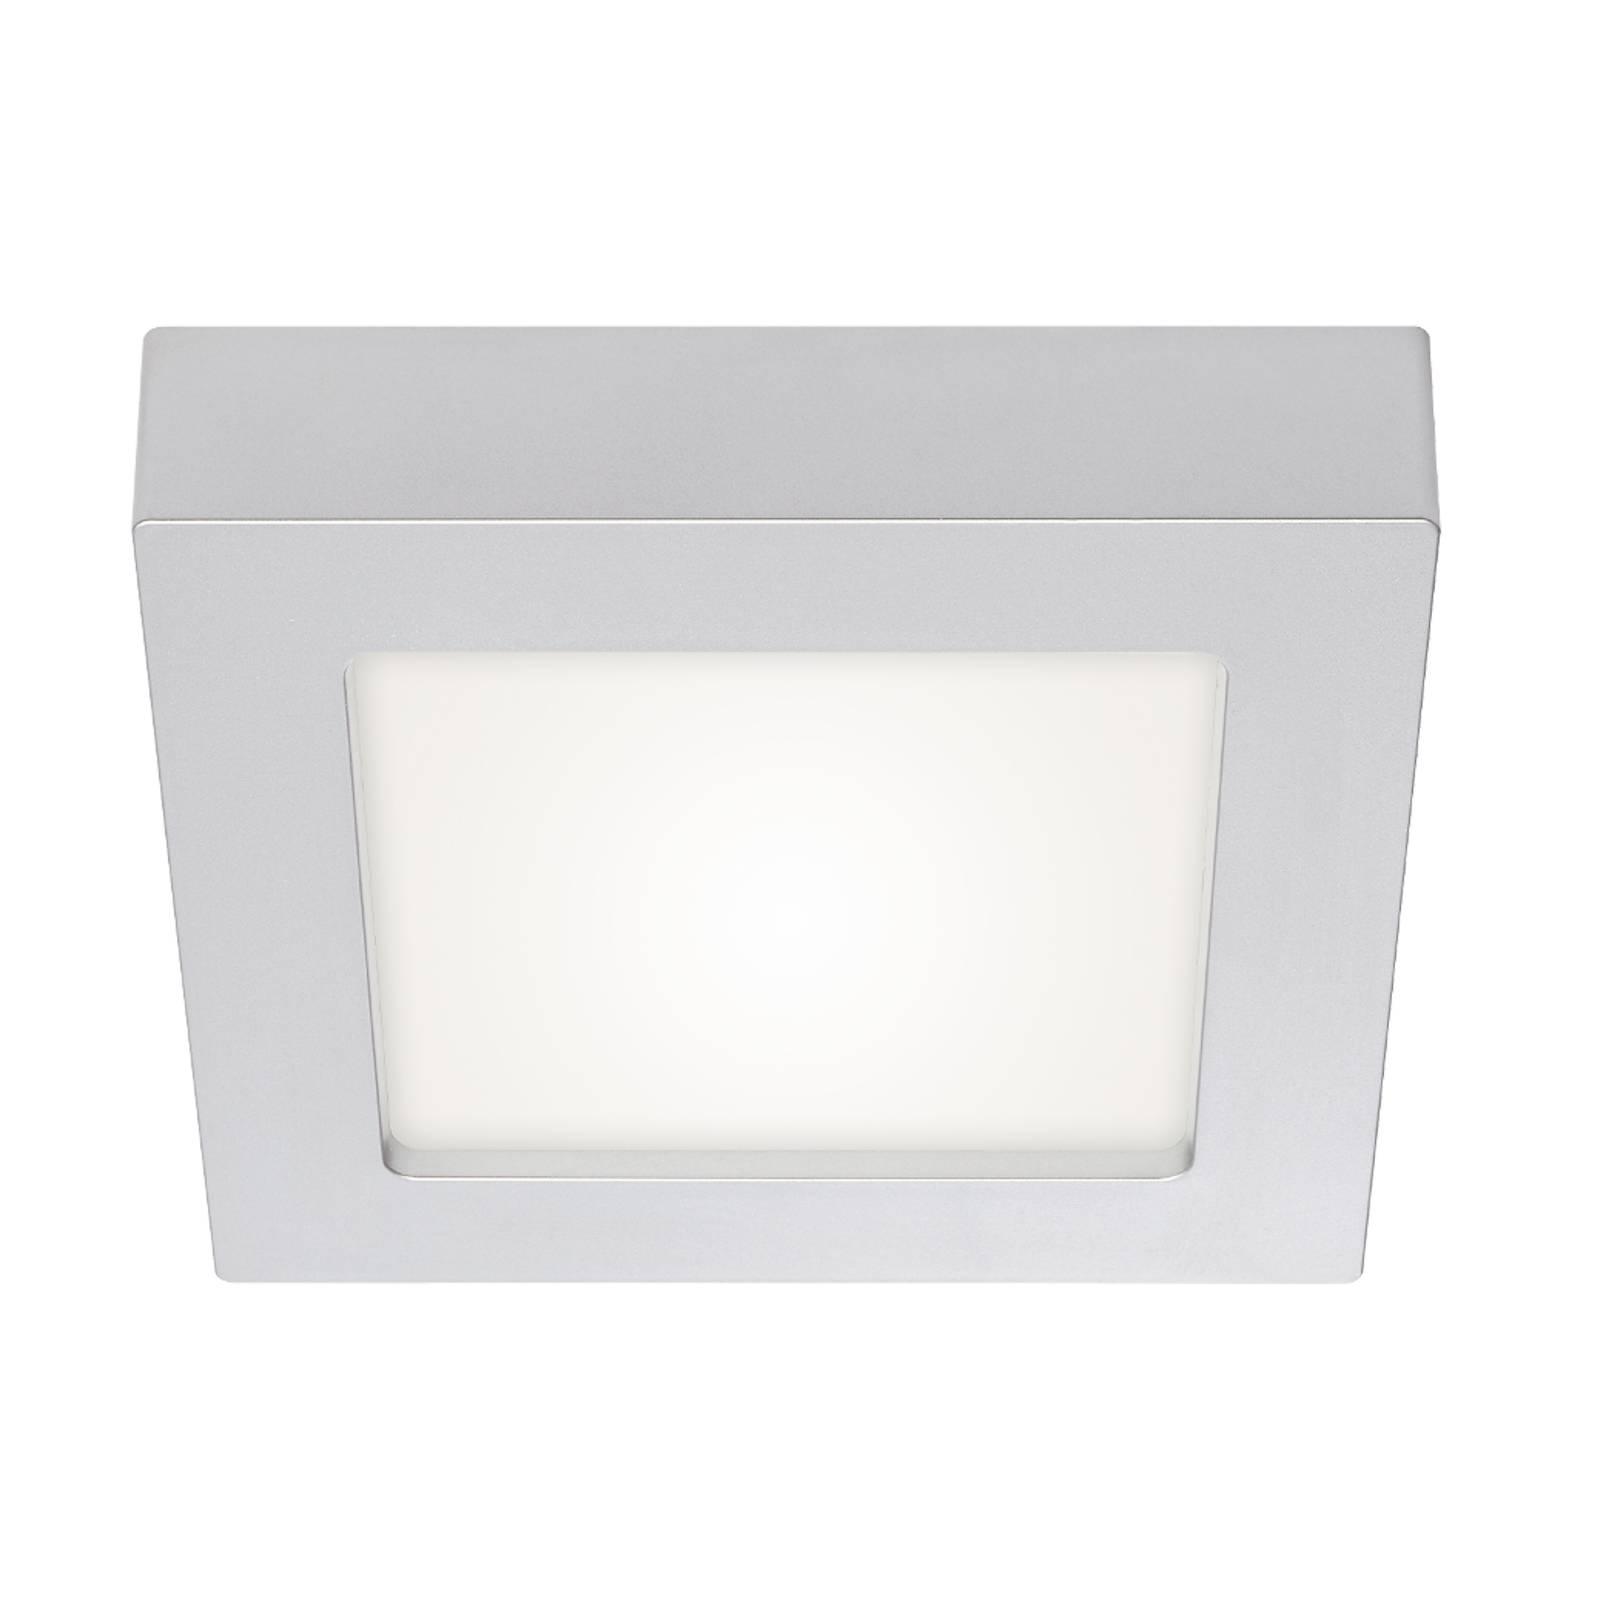 Prios Alette -LED-kattovalaisin hopea, 12,2 cm